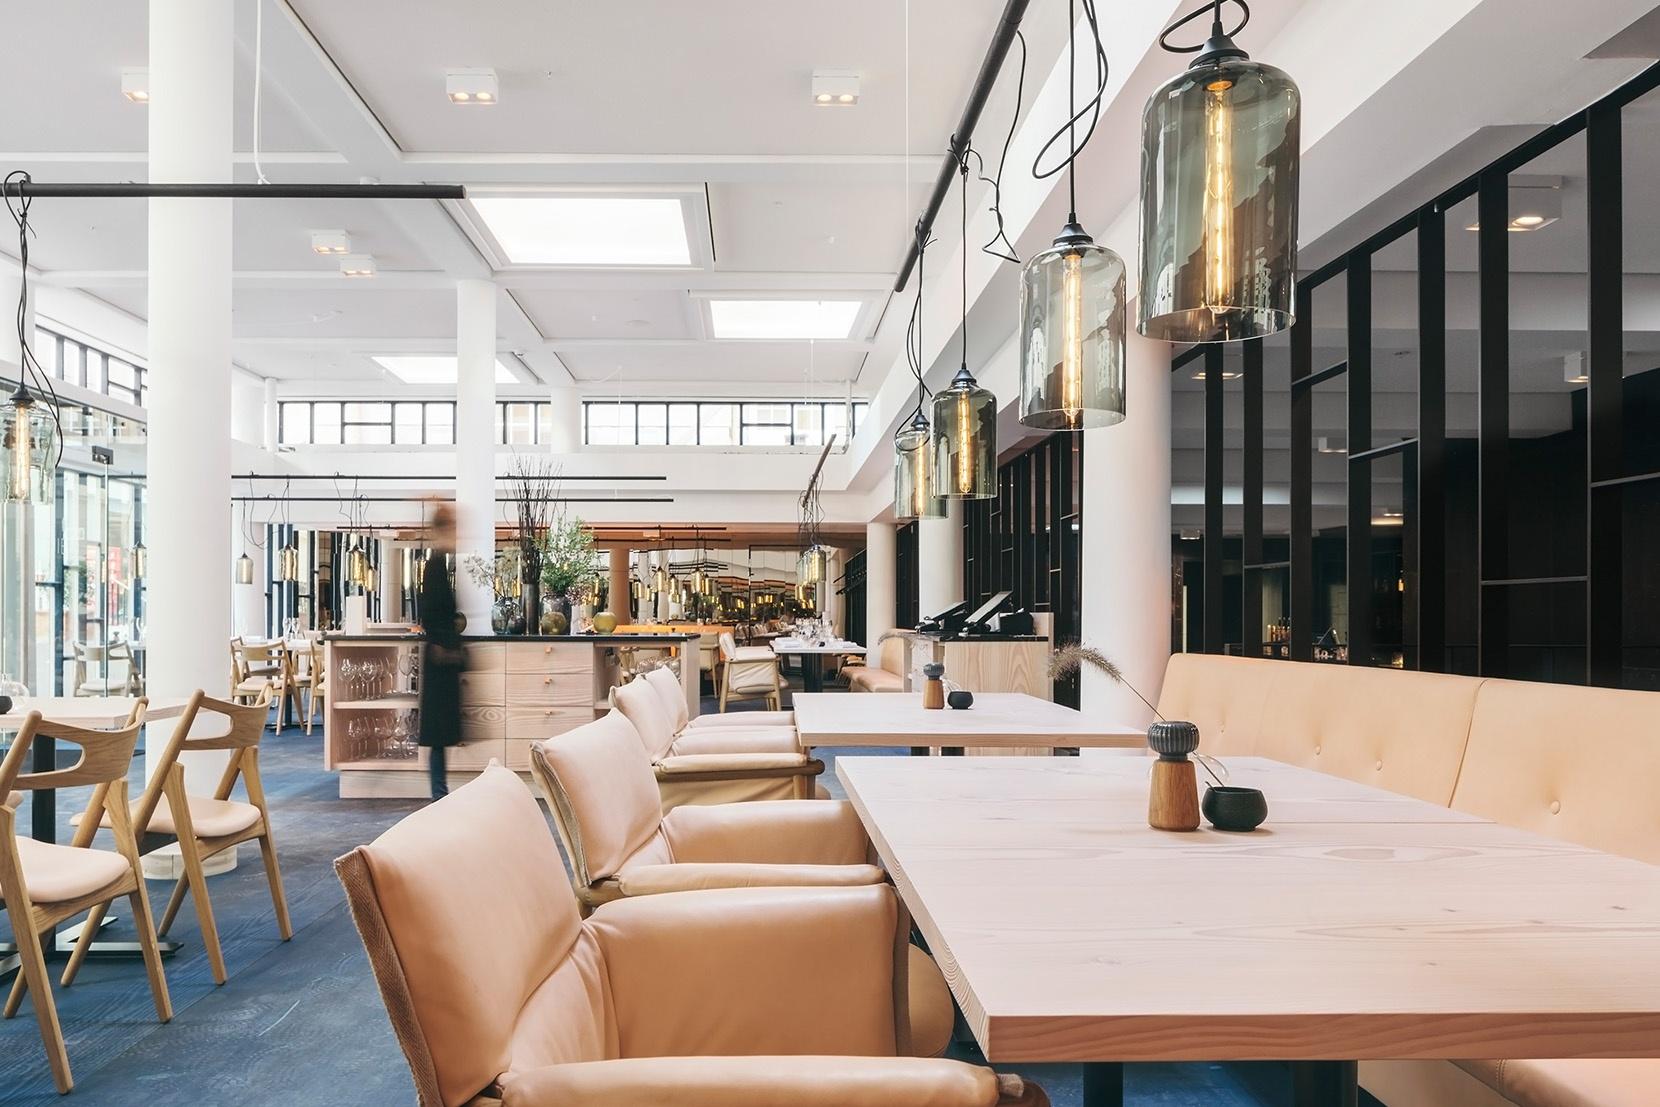 Modern-Lighting-Projects-Hotels-Nobis-Denmark-Bellas.jpg